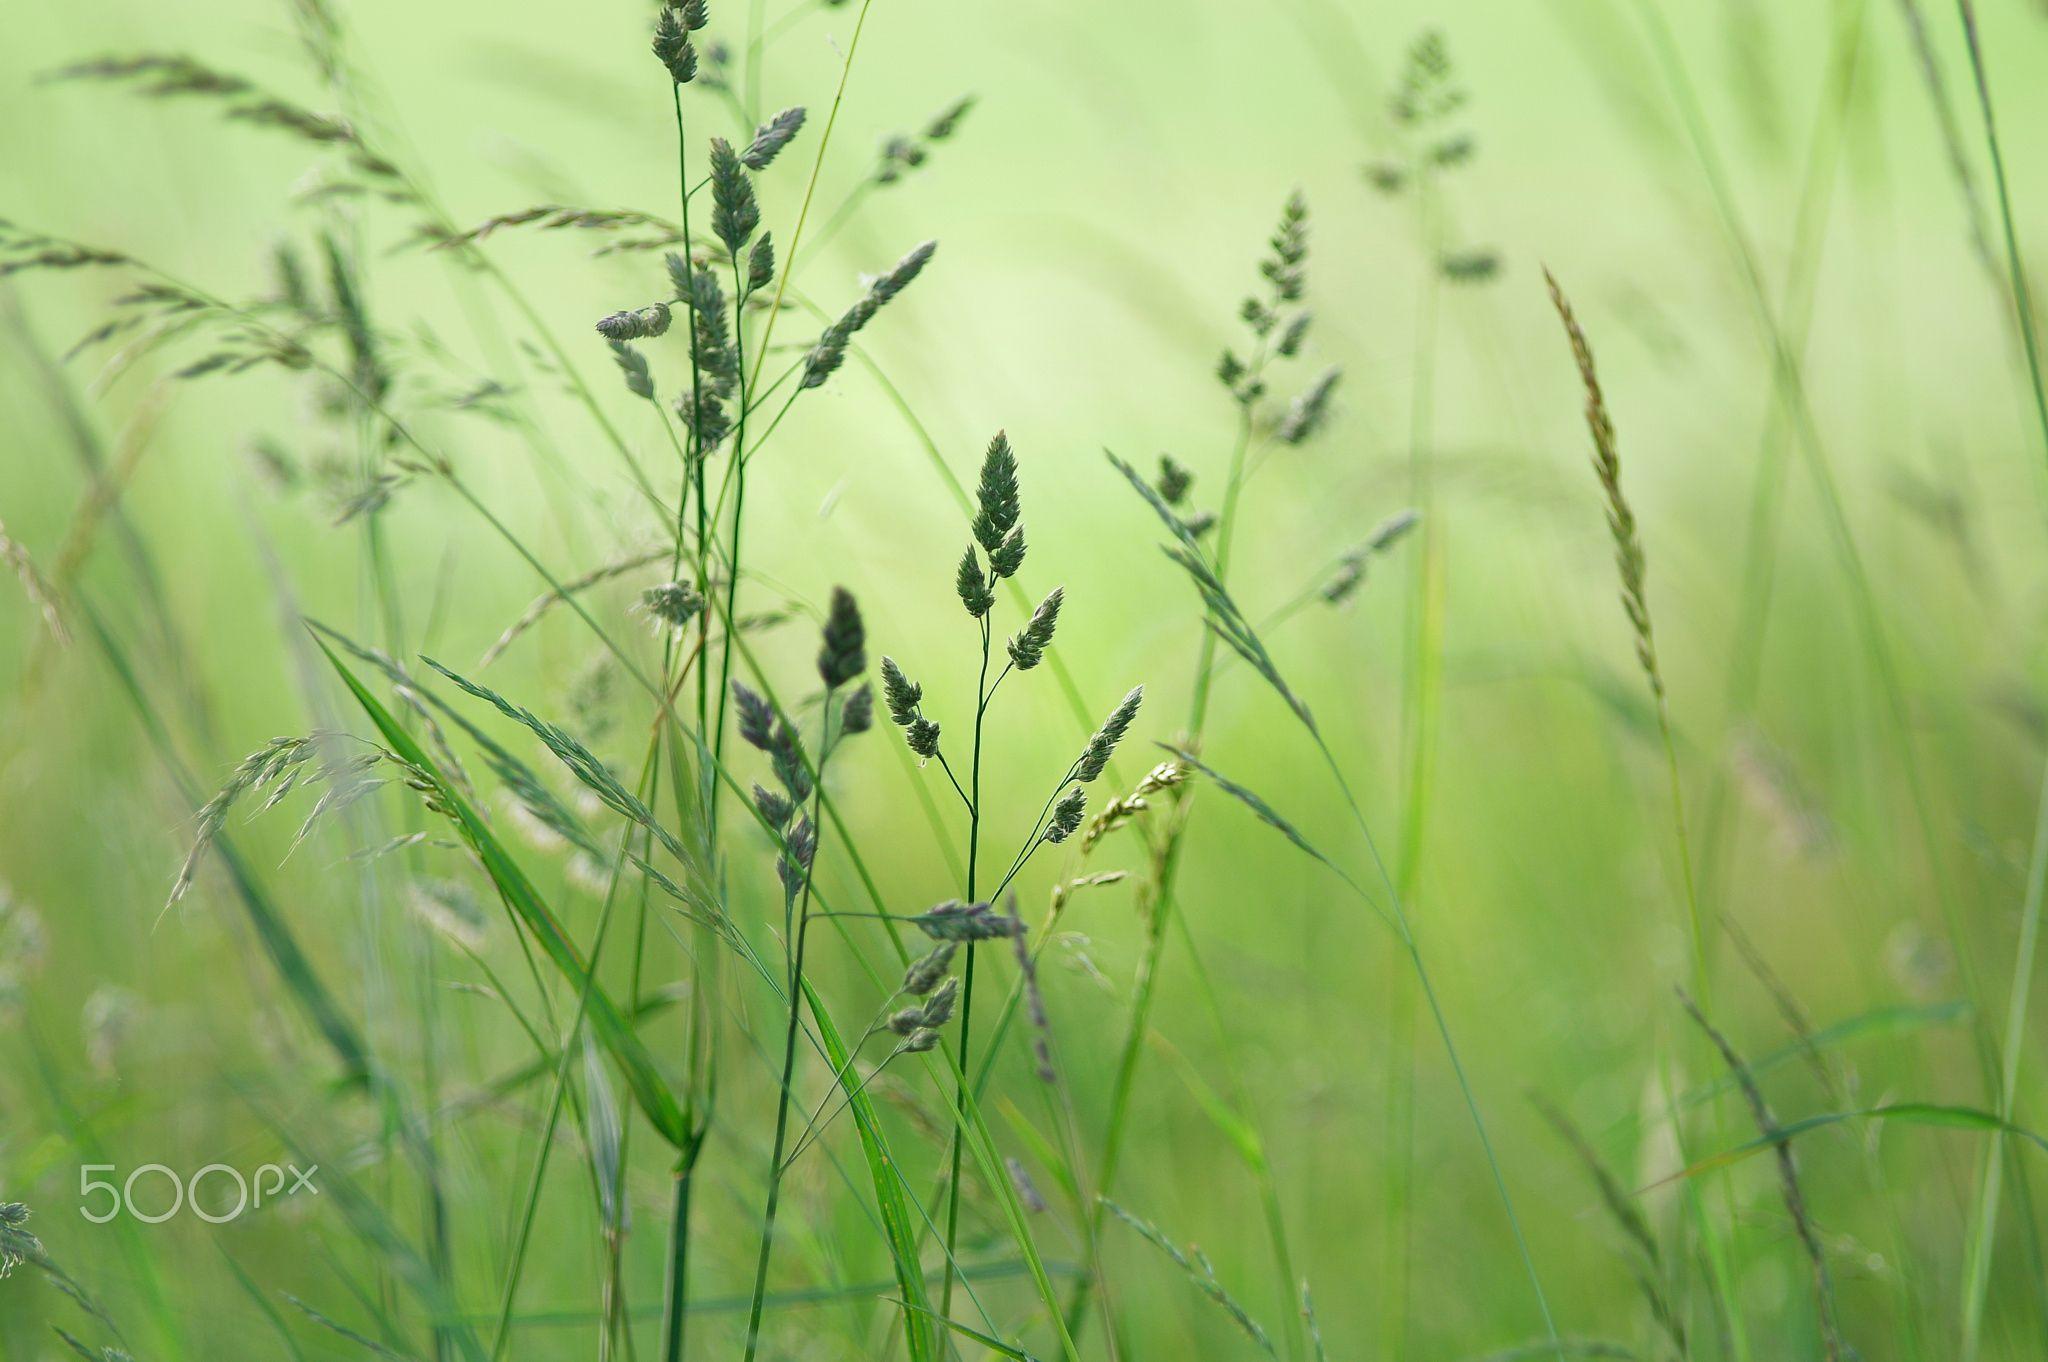 Komm mit in die Wiese / Come on in the meadow by Tanja Riedel - Photo 113259497 - 500px